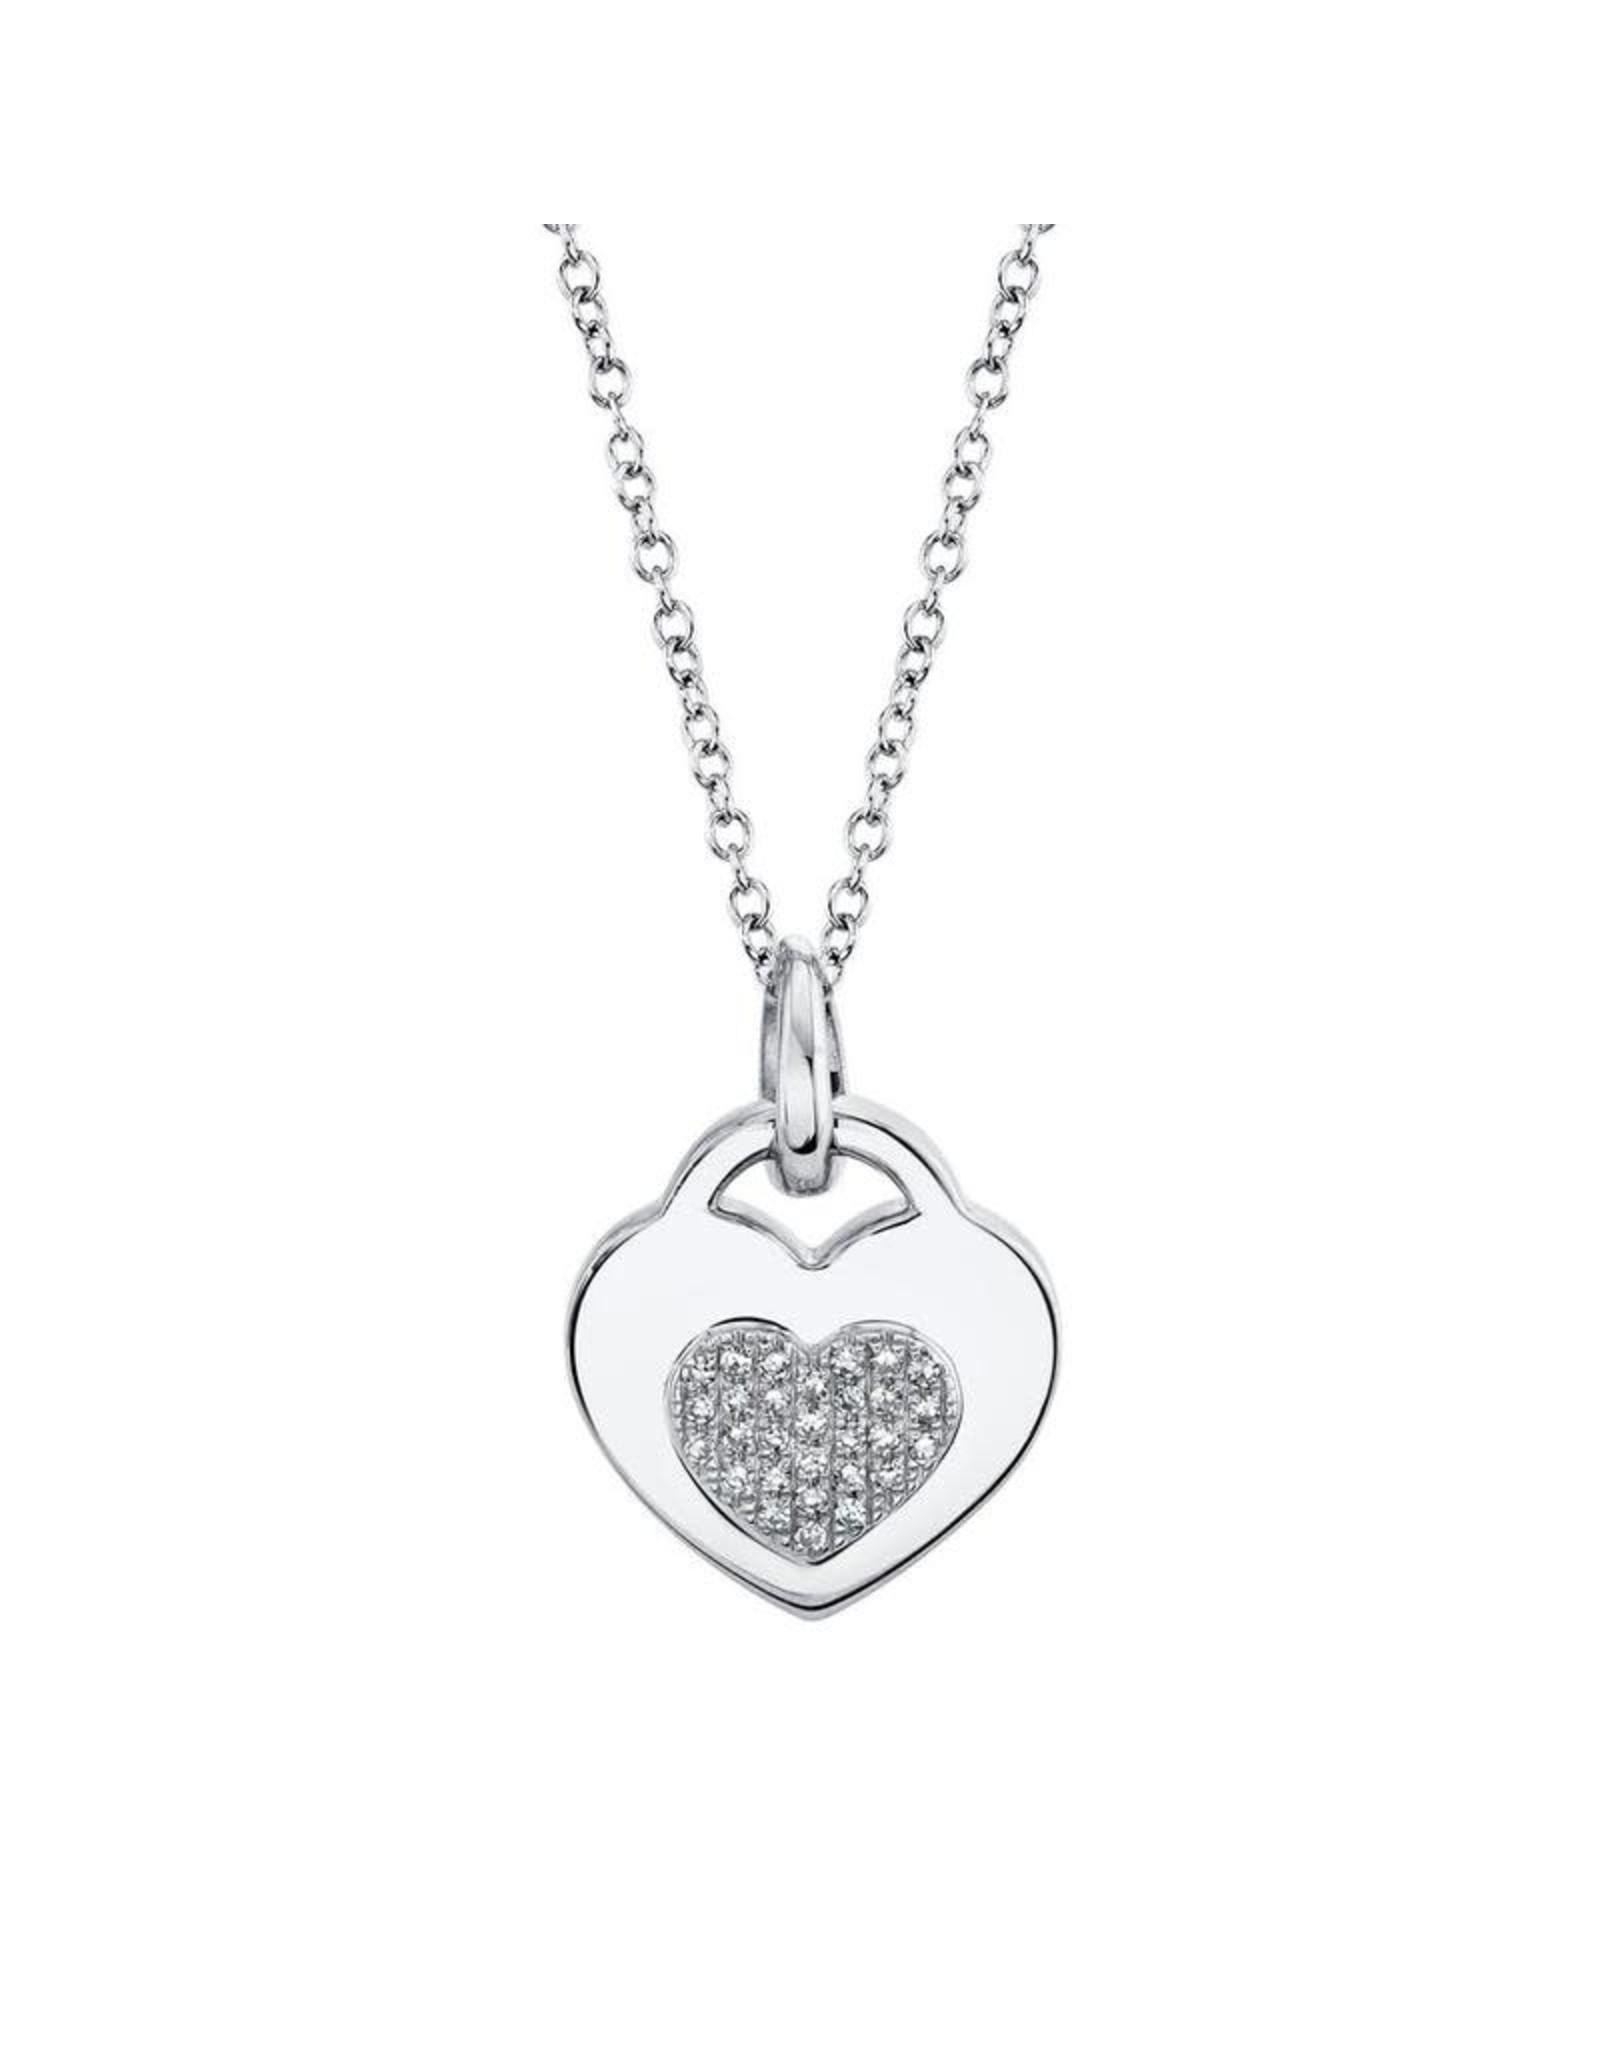 14K White Gold Diamond Heart Locket Necklace, D: 0.06ct